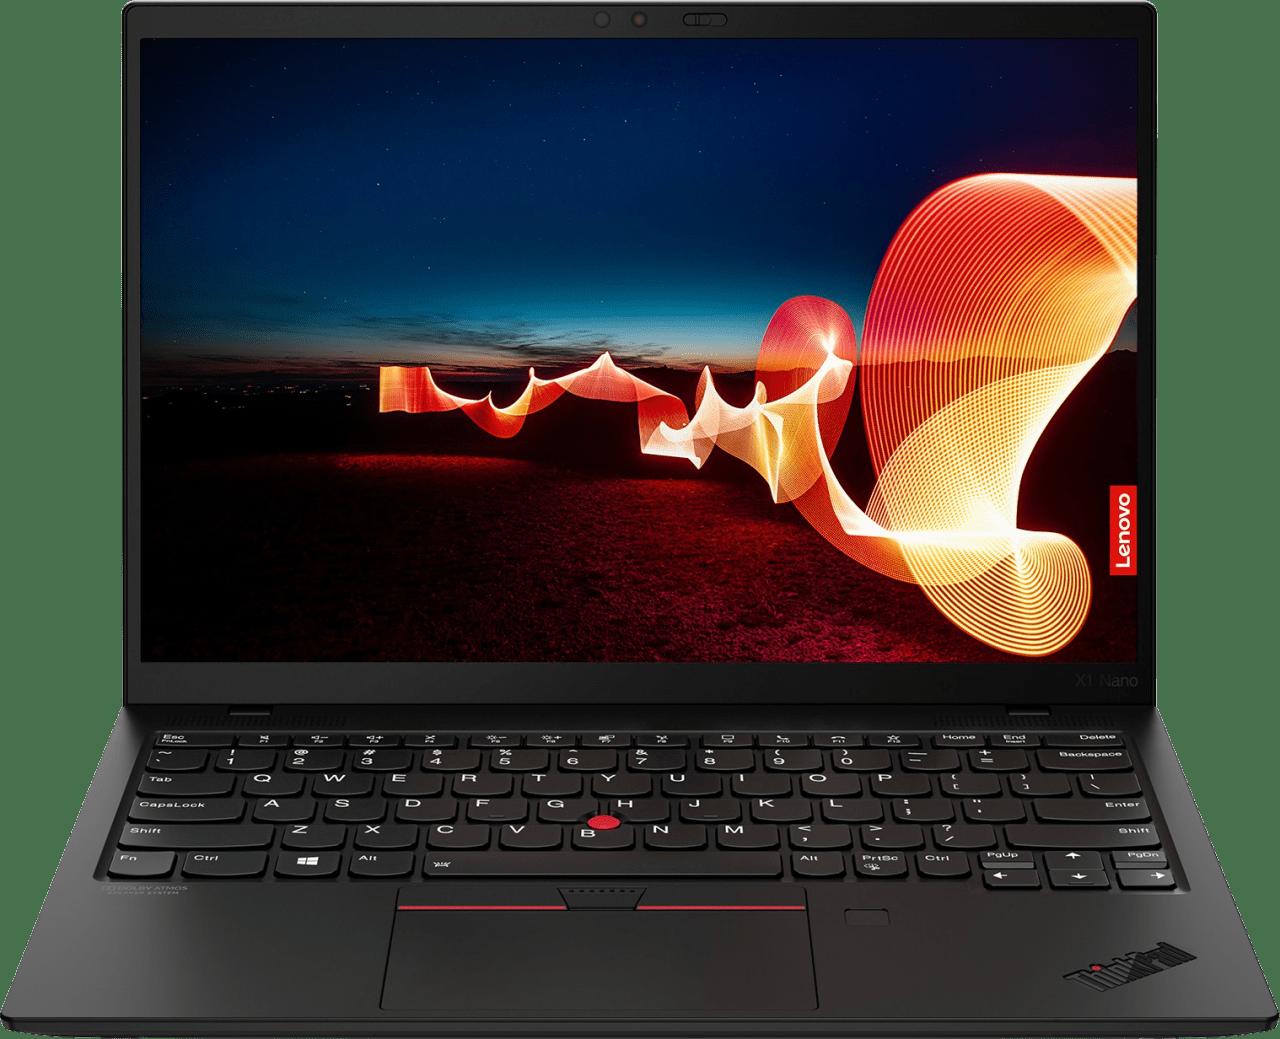 Schwarz Lenovo ThinkPad X1 Nano Notebook - Intel® Core™ i5-1130G7 - 16GB - 512GB SSD - Intel® Iris® Xe Graphics.1